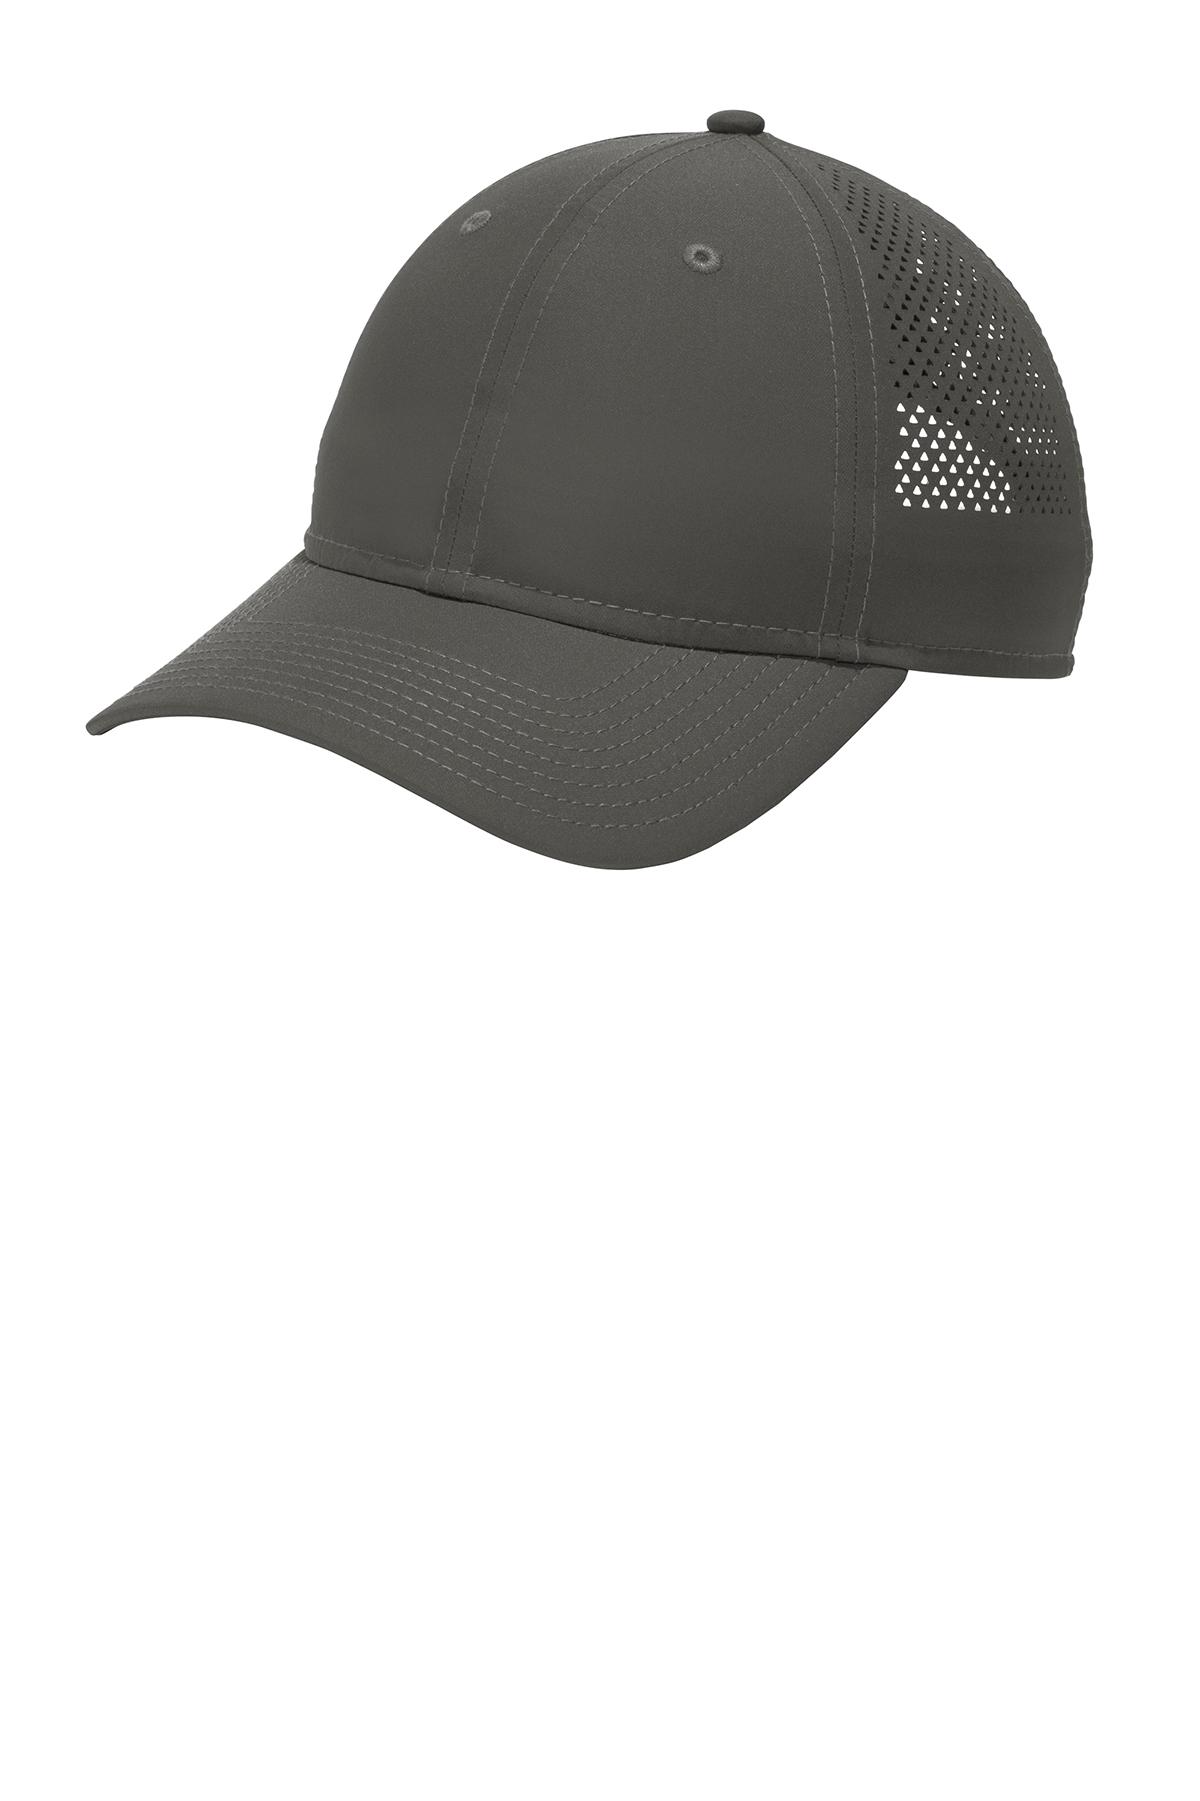 11237083a99 New Era ® Perforated Performance Cap